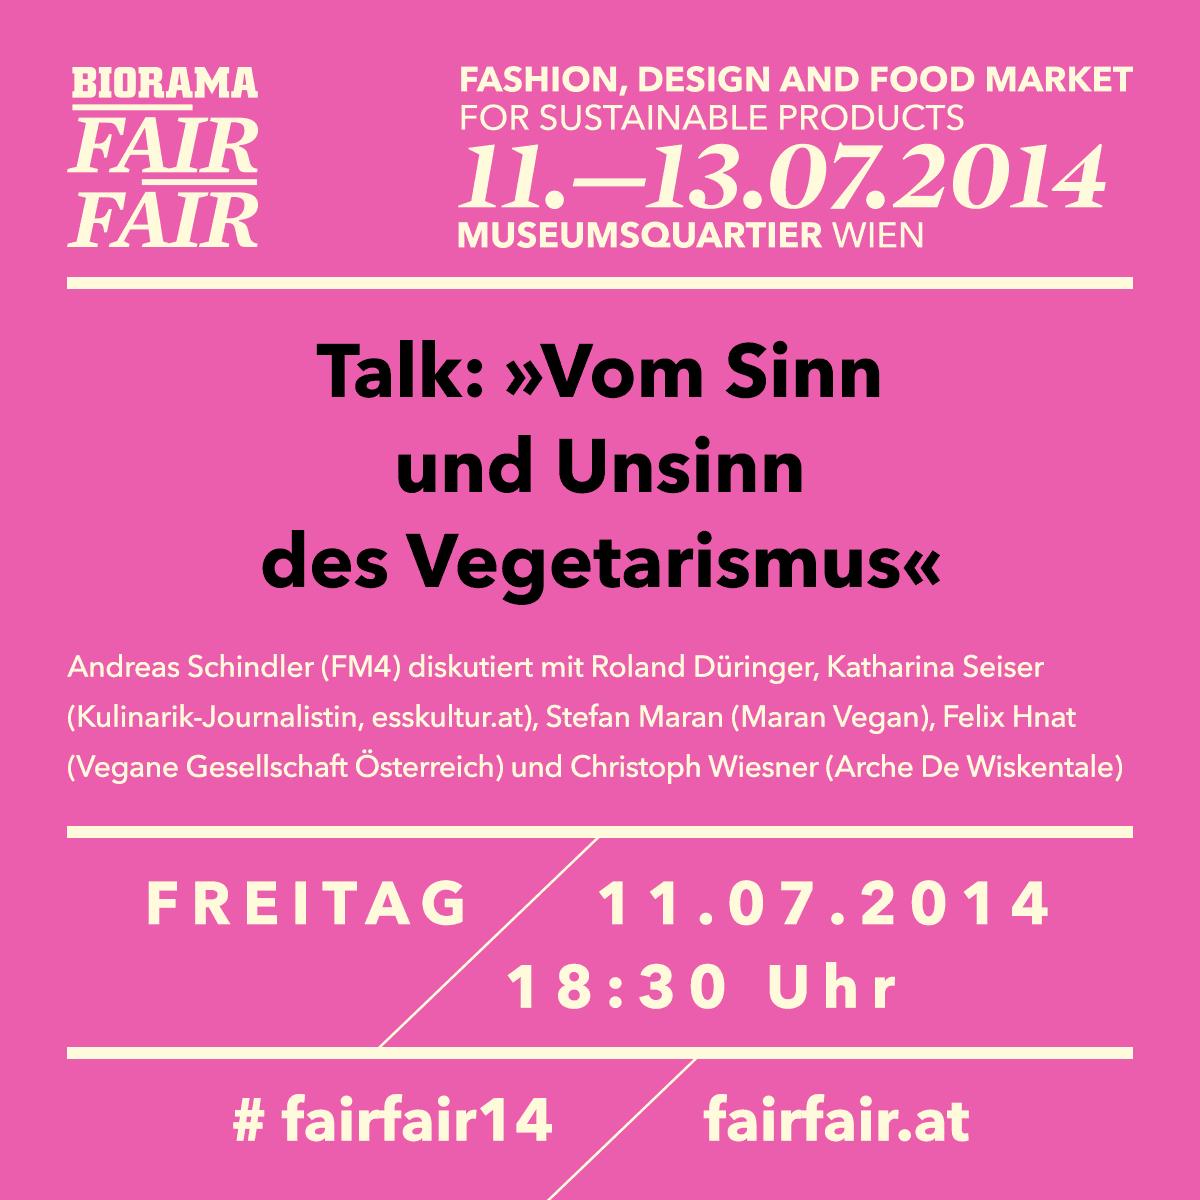 biorama_fairfair_talk_vegetarismus